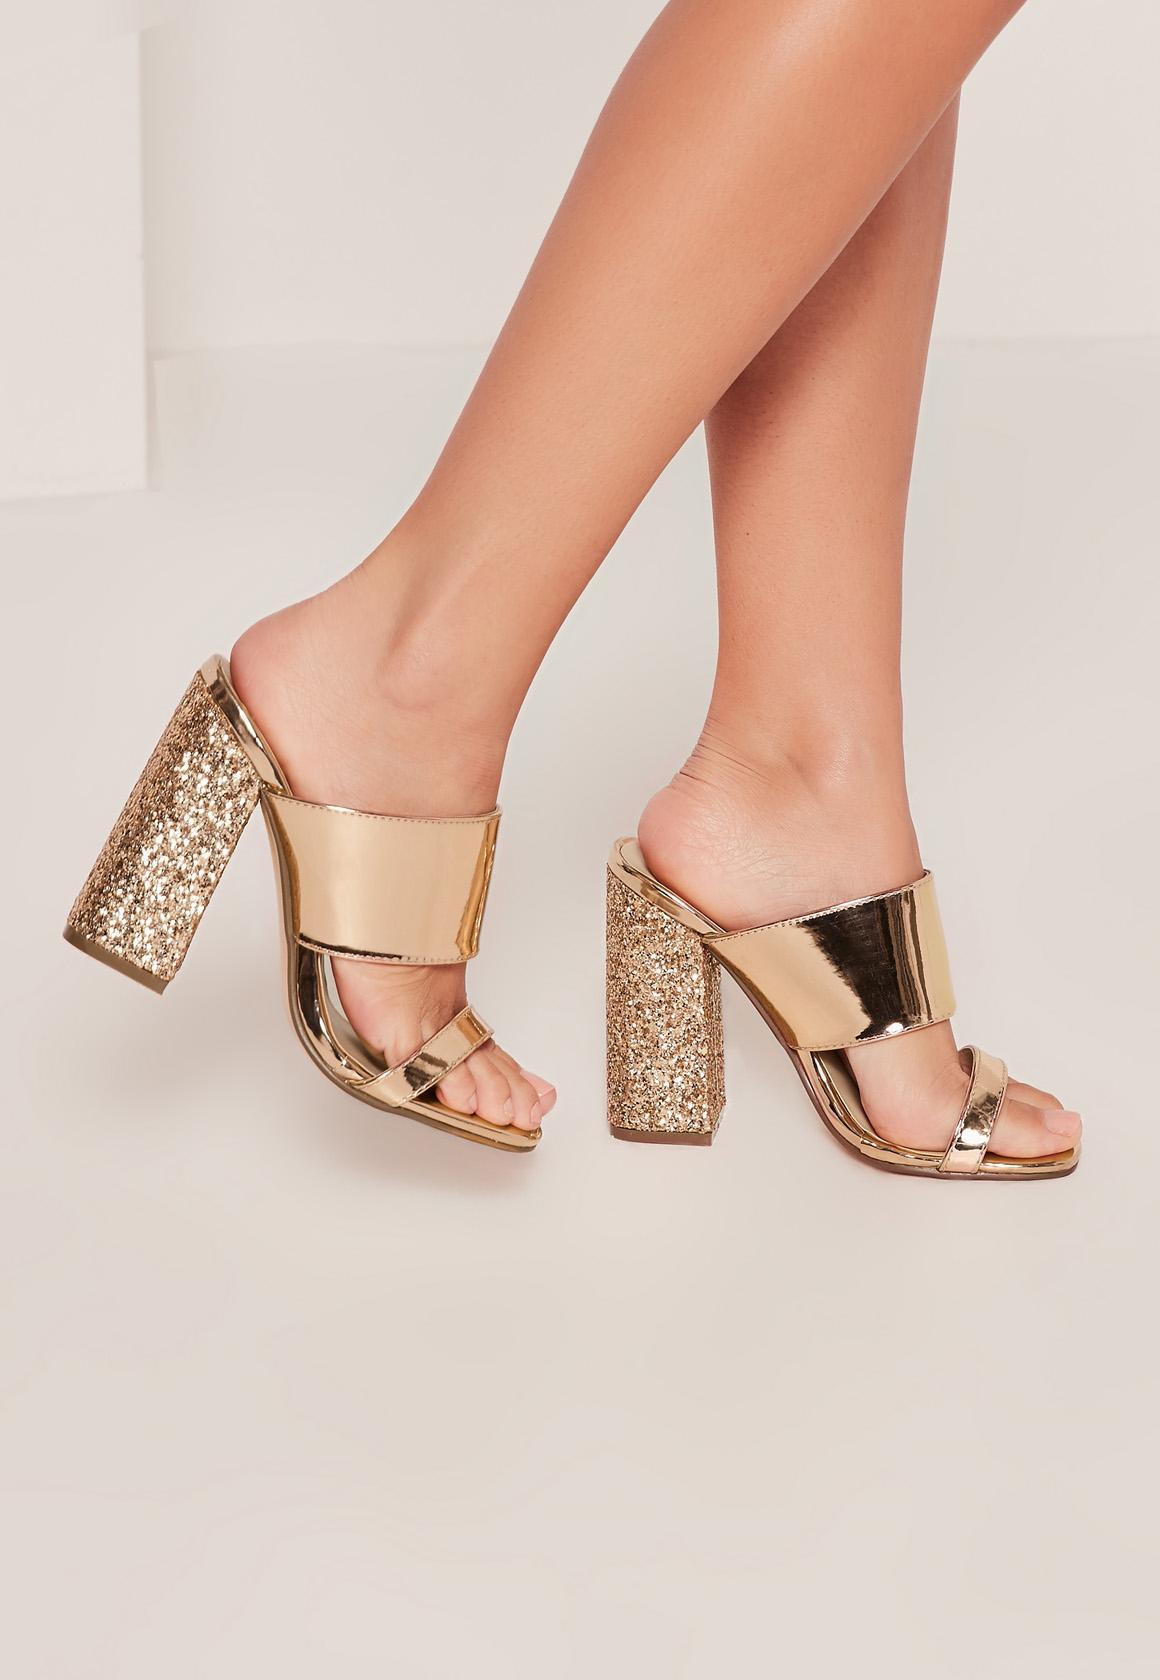 Missguided Gold Glitter Block Heel Mule Sandals In